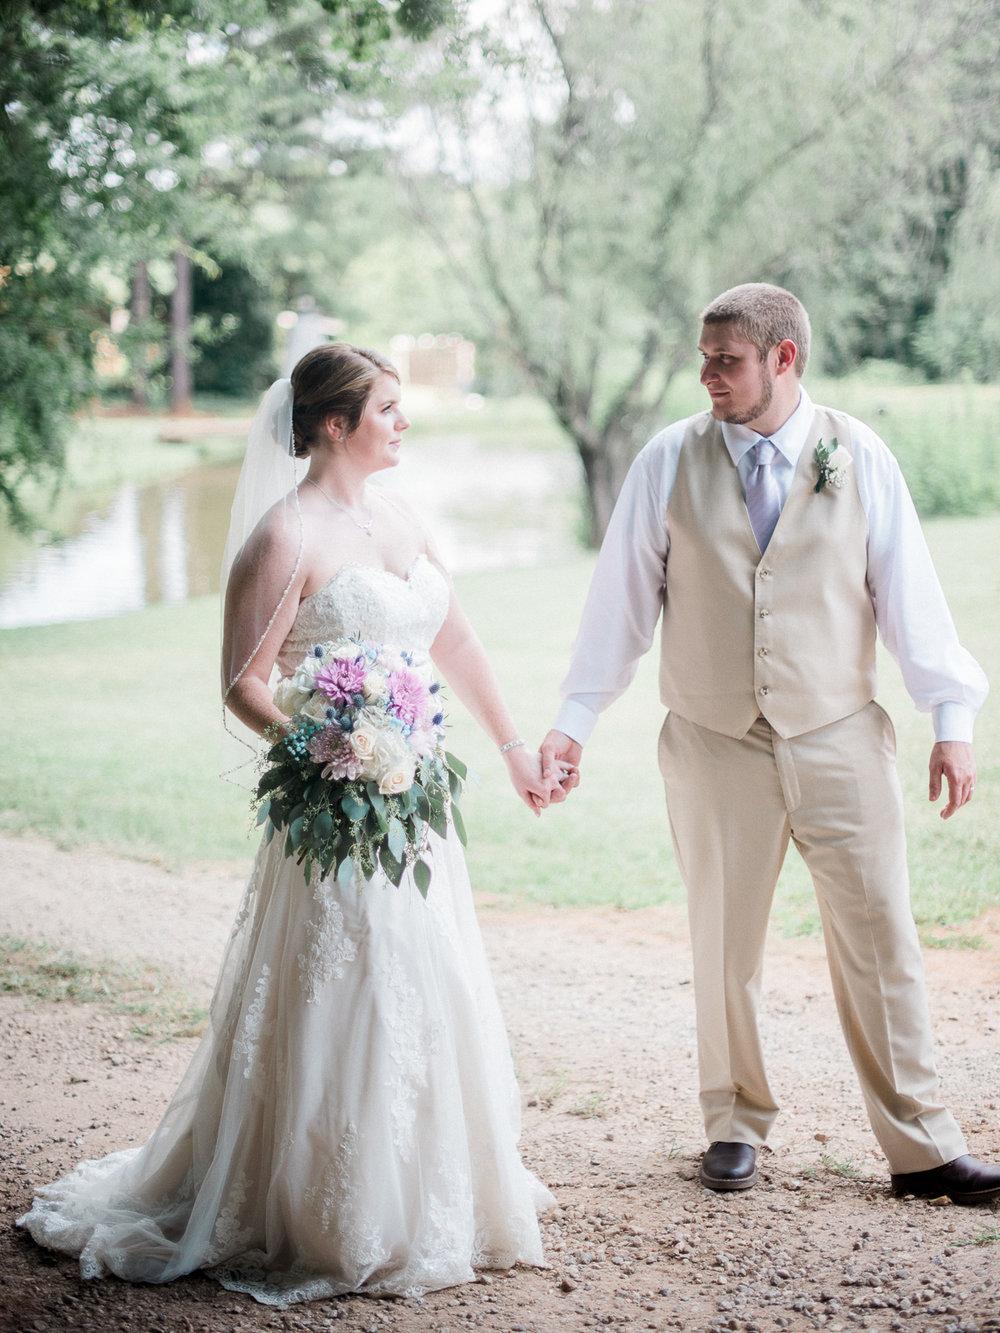 taryntyler-bride&groomportraits-christinadavisphoto39.jpg